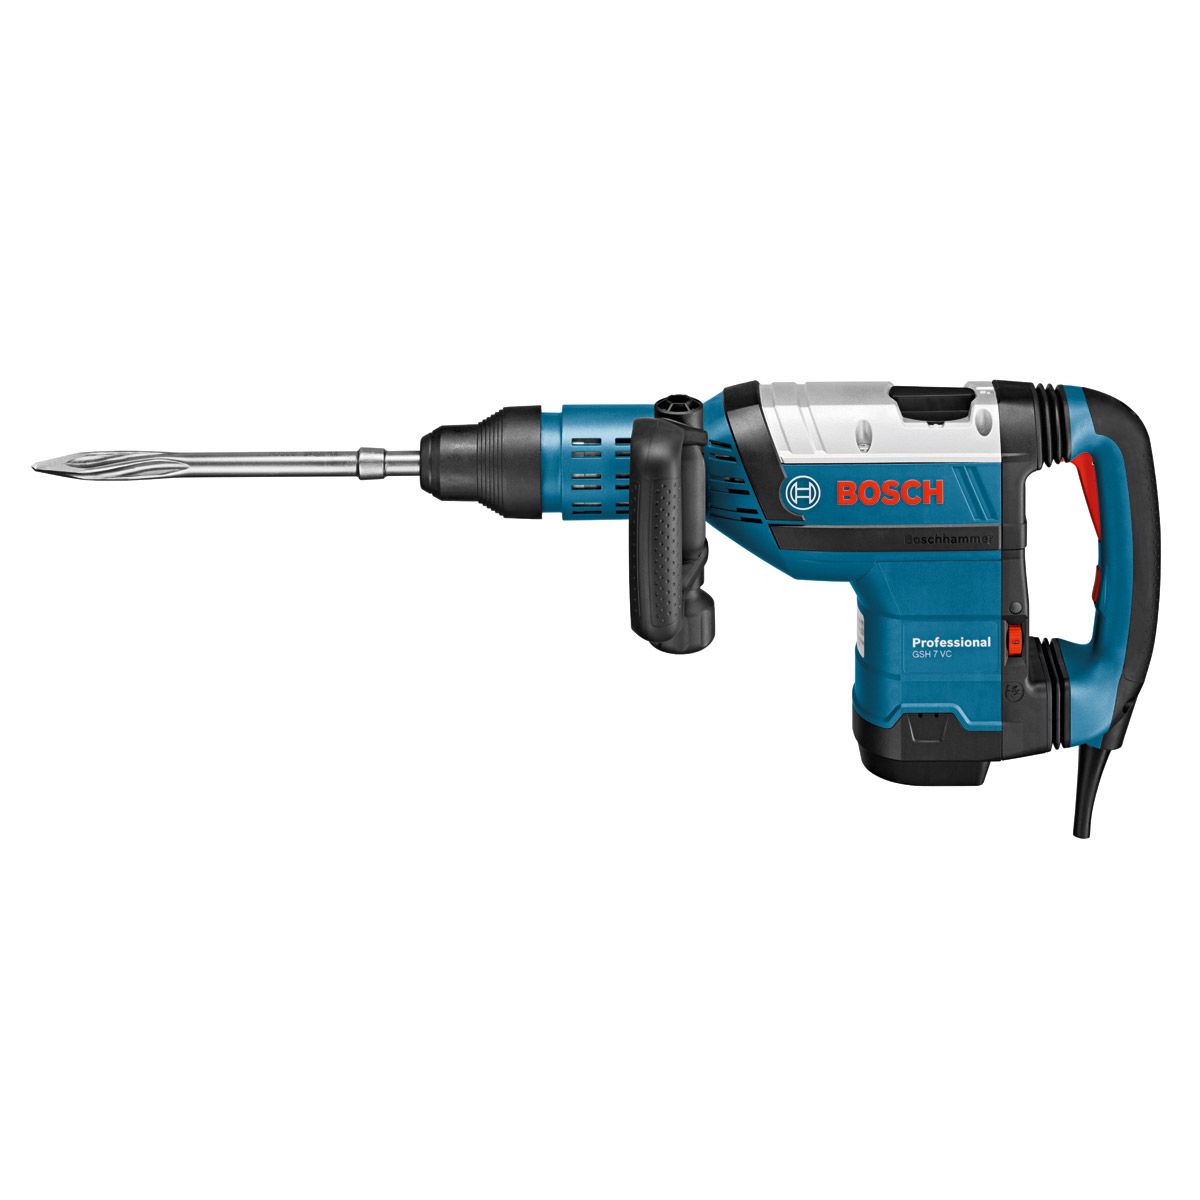 toolstop bosch gsh7vc professional sds max demolition hammer drill 110v. Black Bedroom Furniture Sets. Home Design Ideas